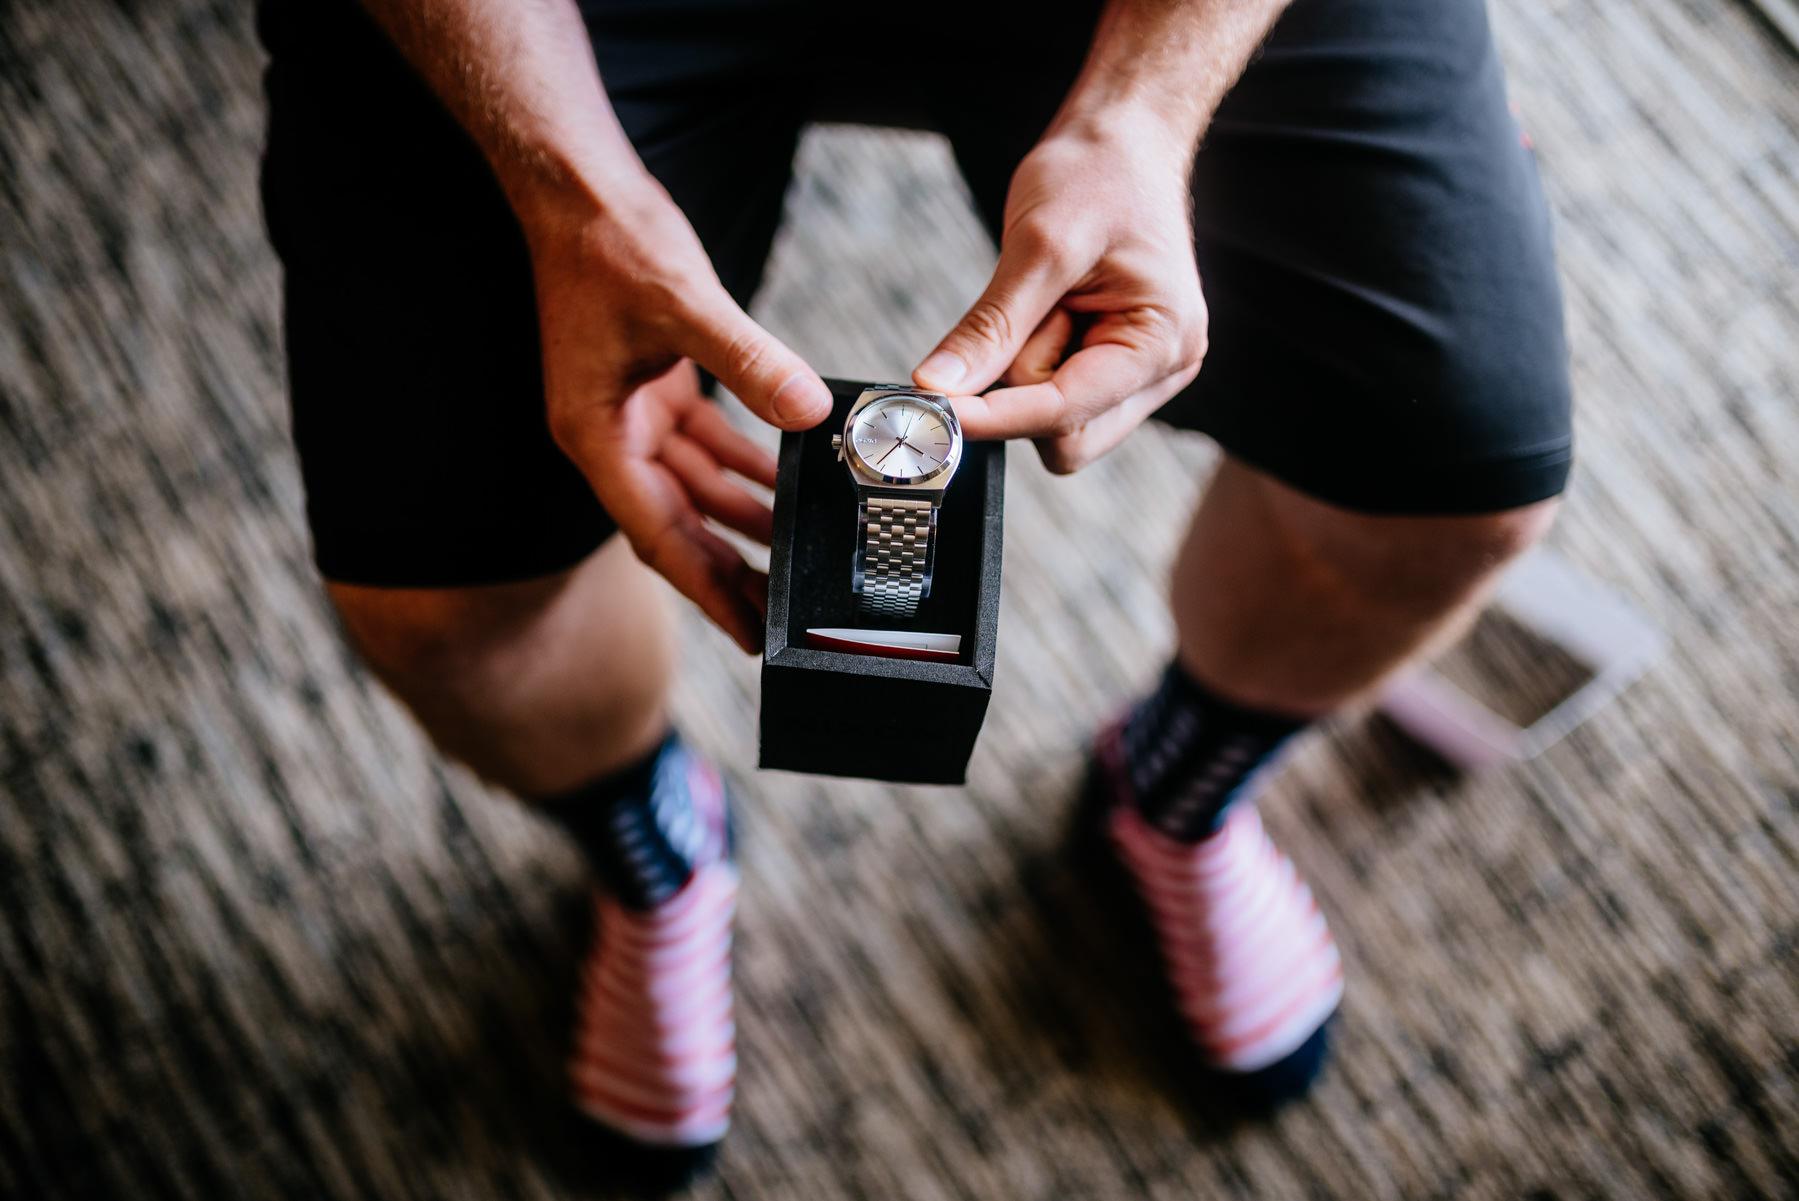 groom receives watch as gift